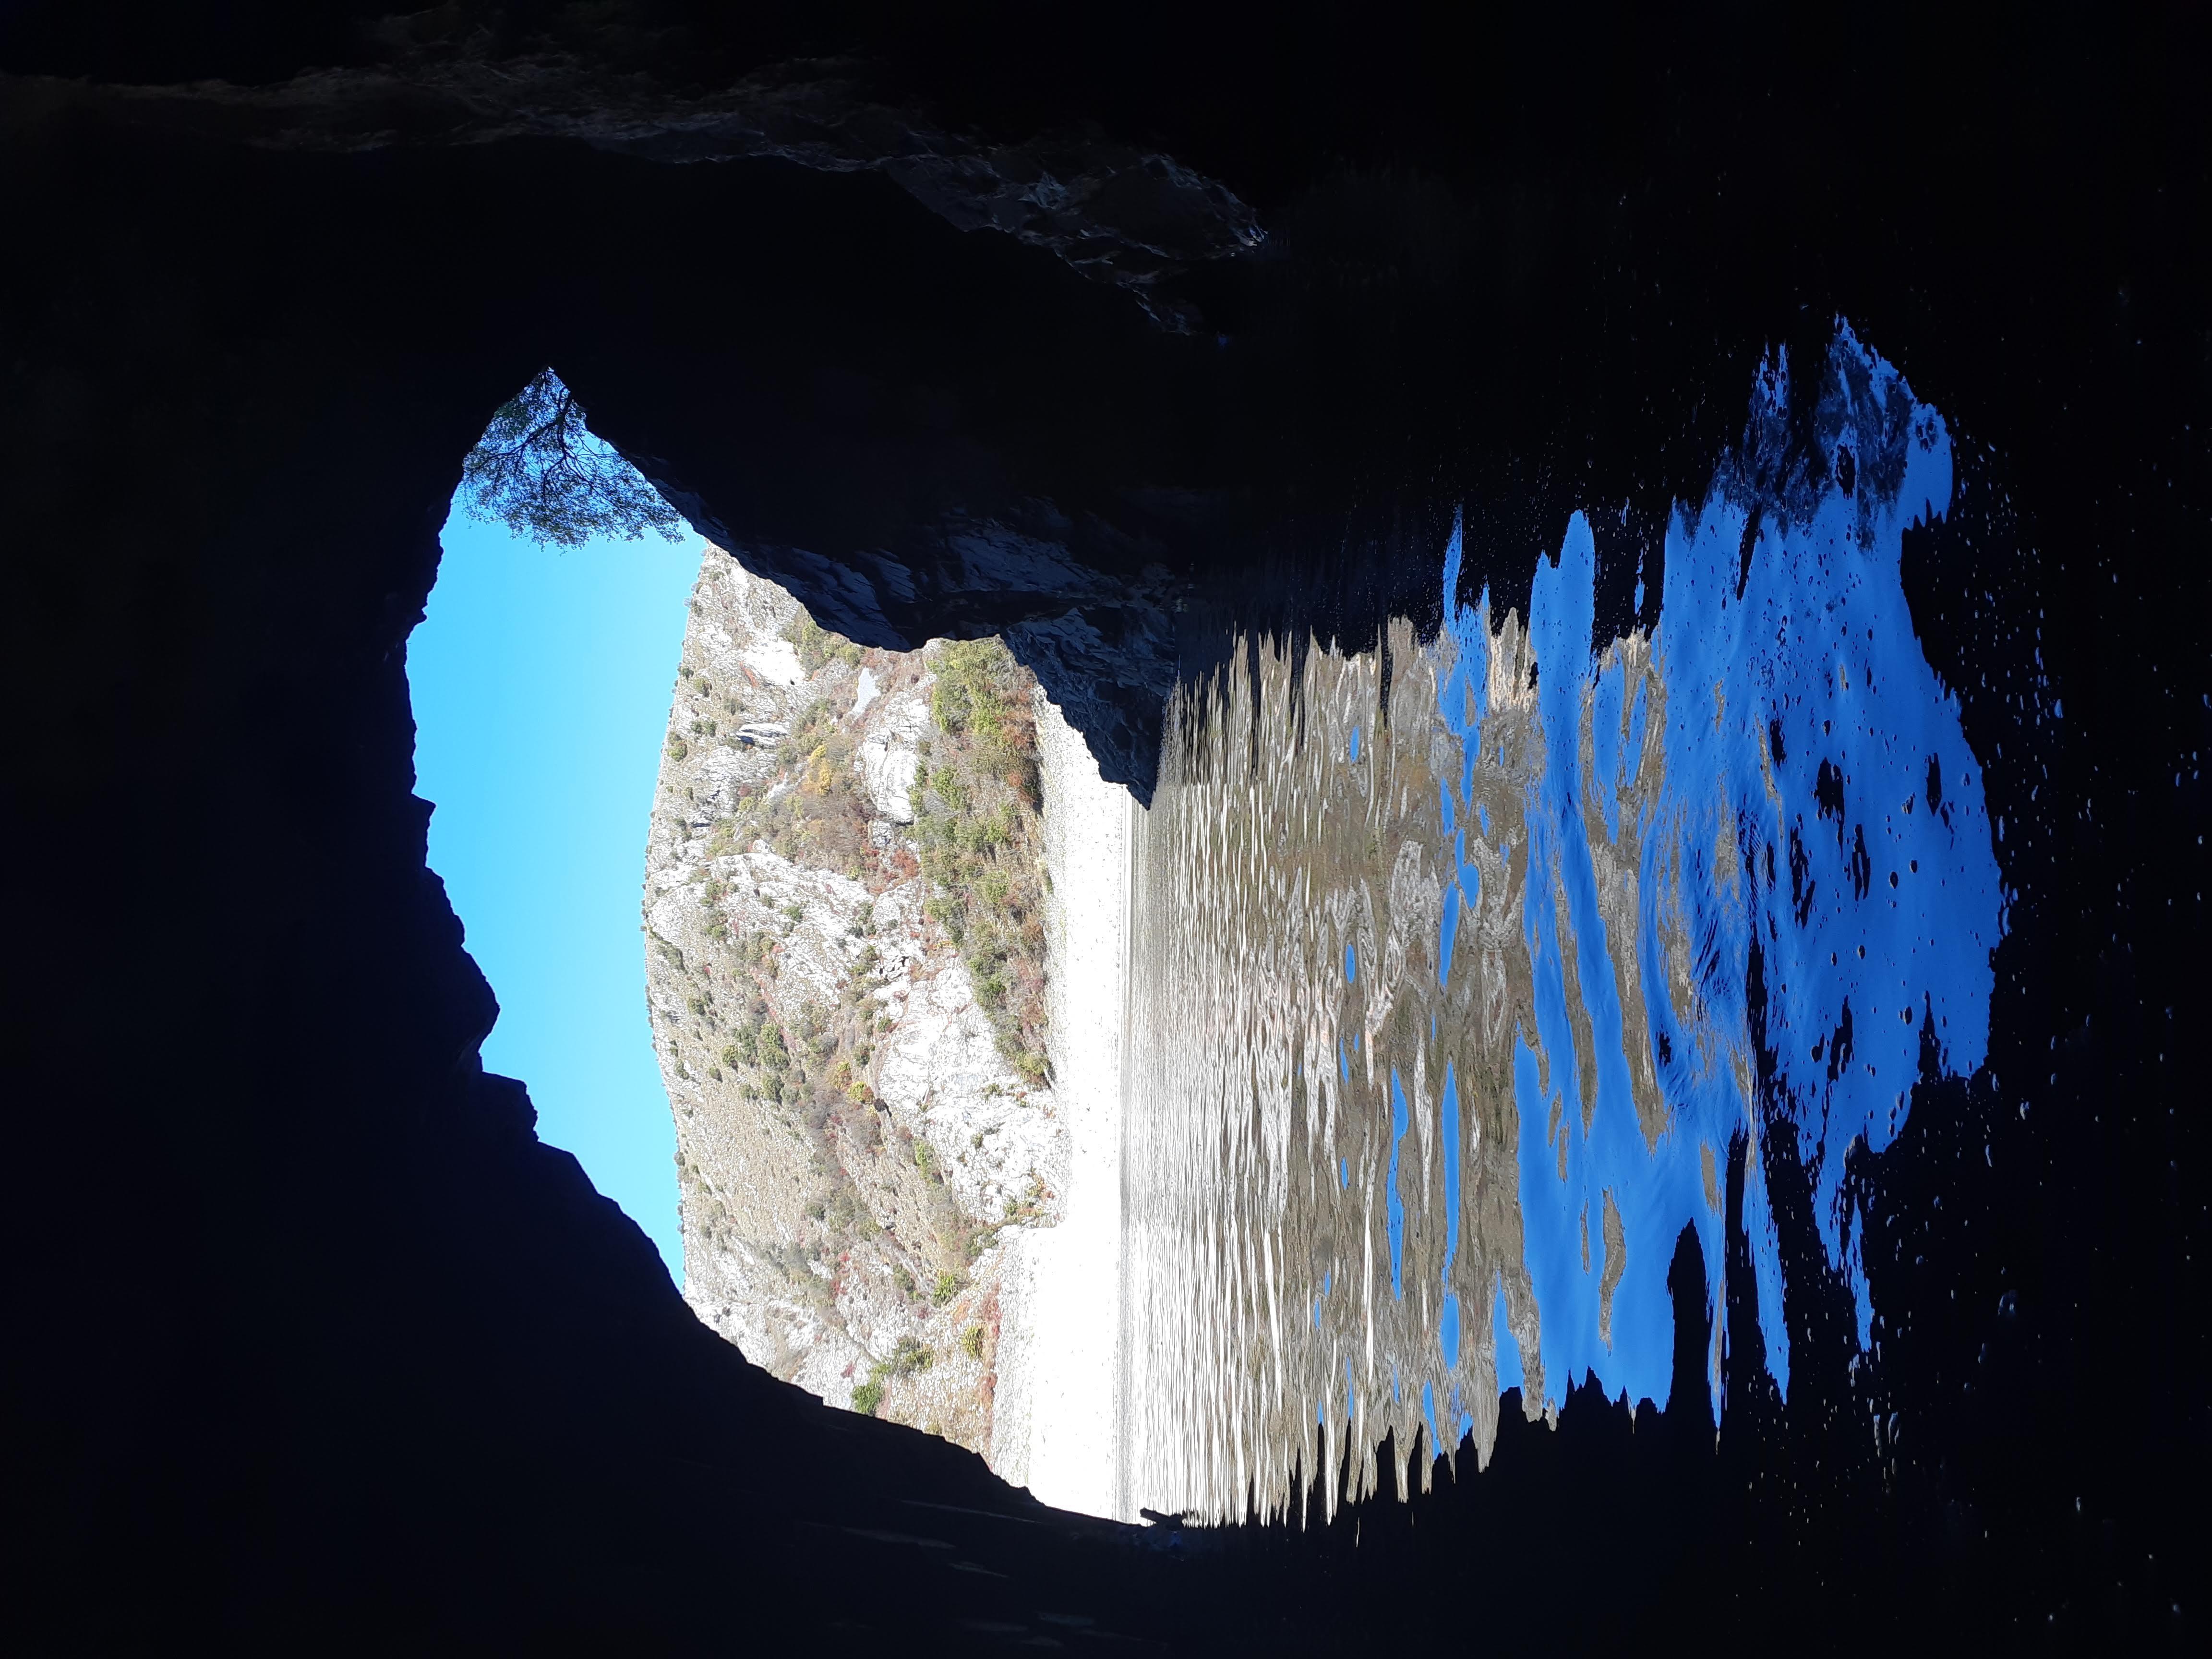 Cave photo contest 016